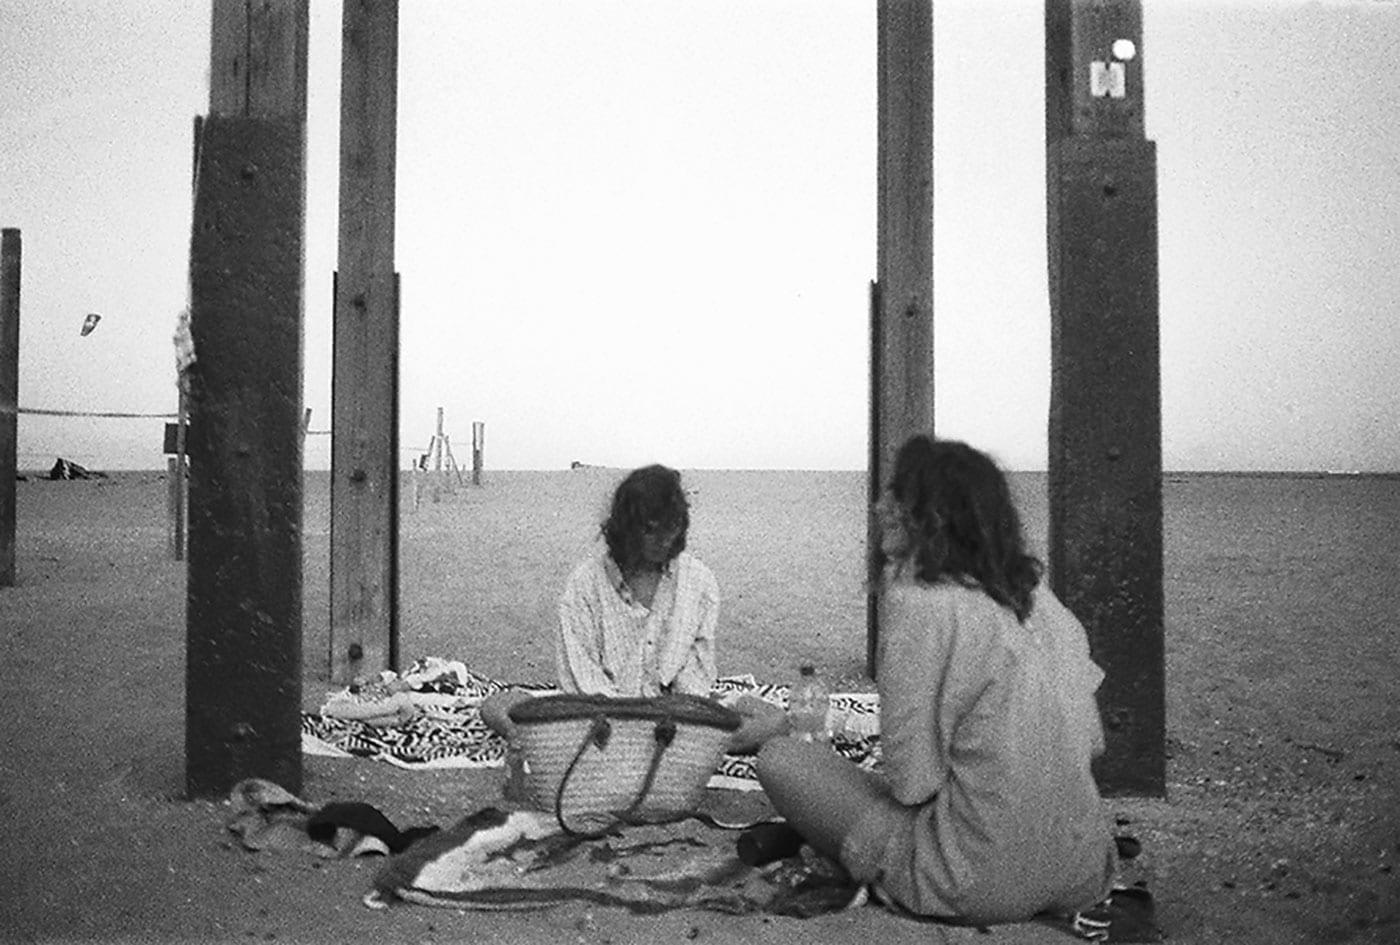 beach, roses, sant pere pescador, costa brava, vintage